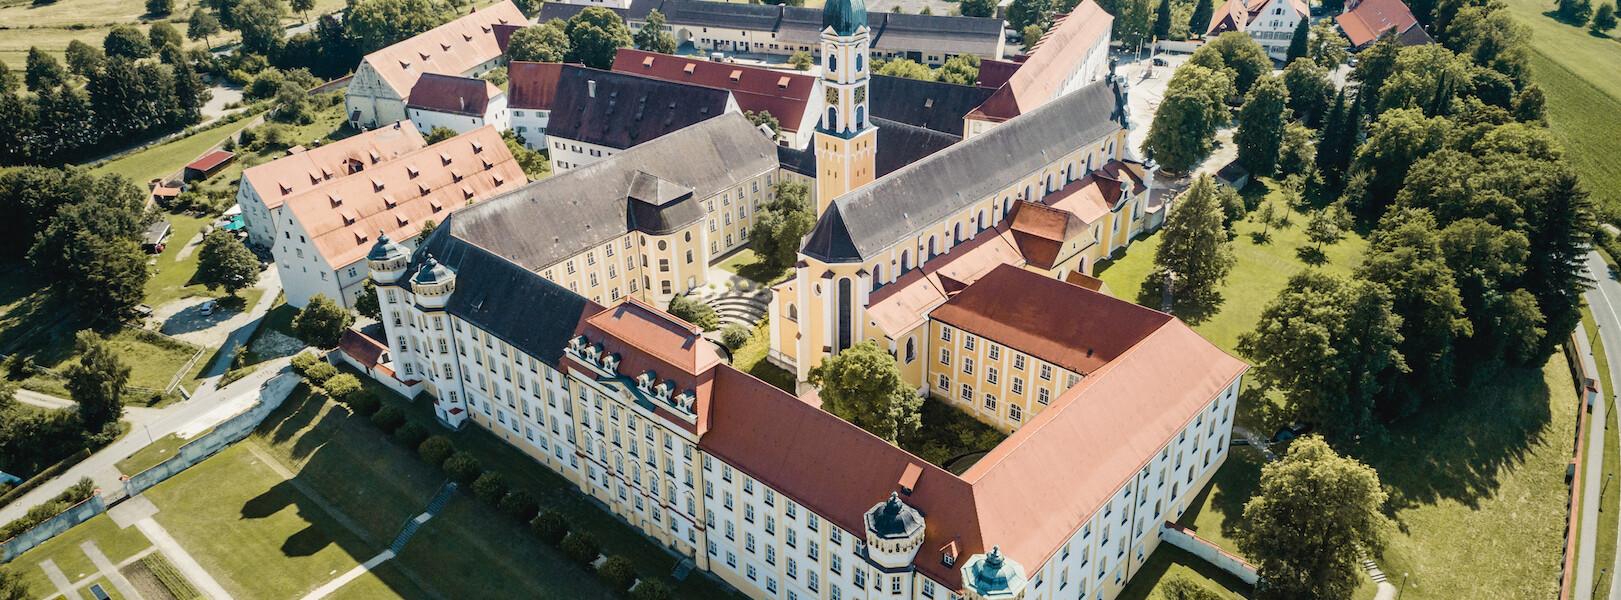 Kloster Ochsenhausen © Oberschwaben Tourismus